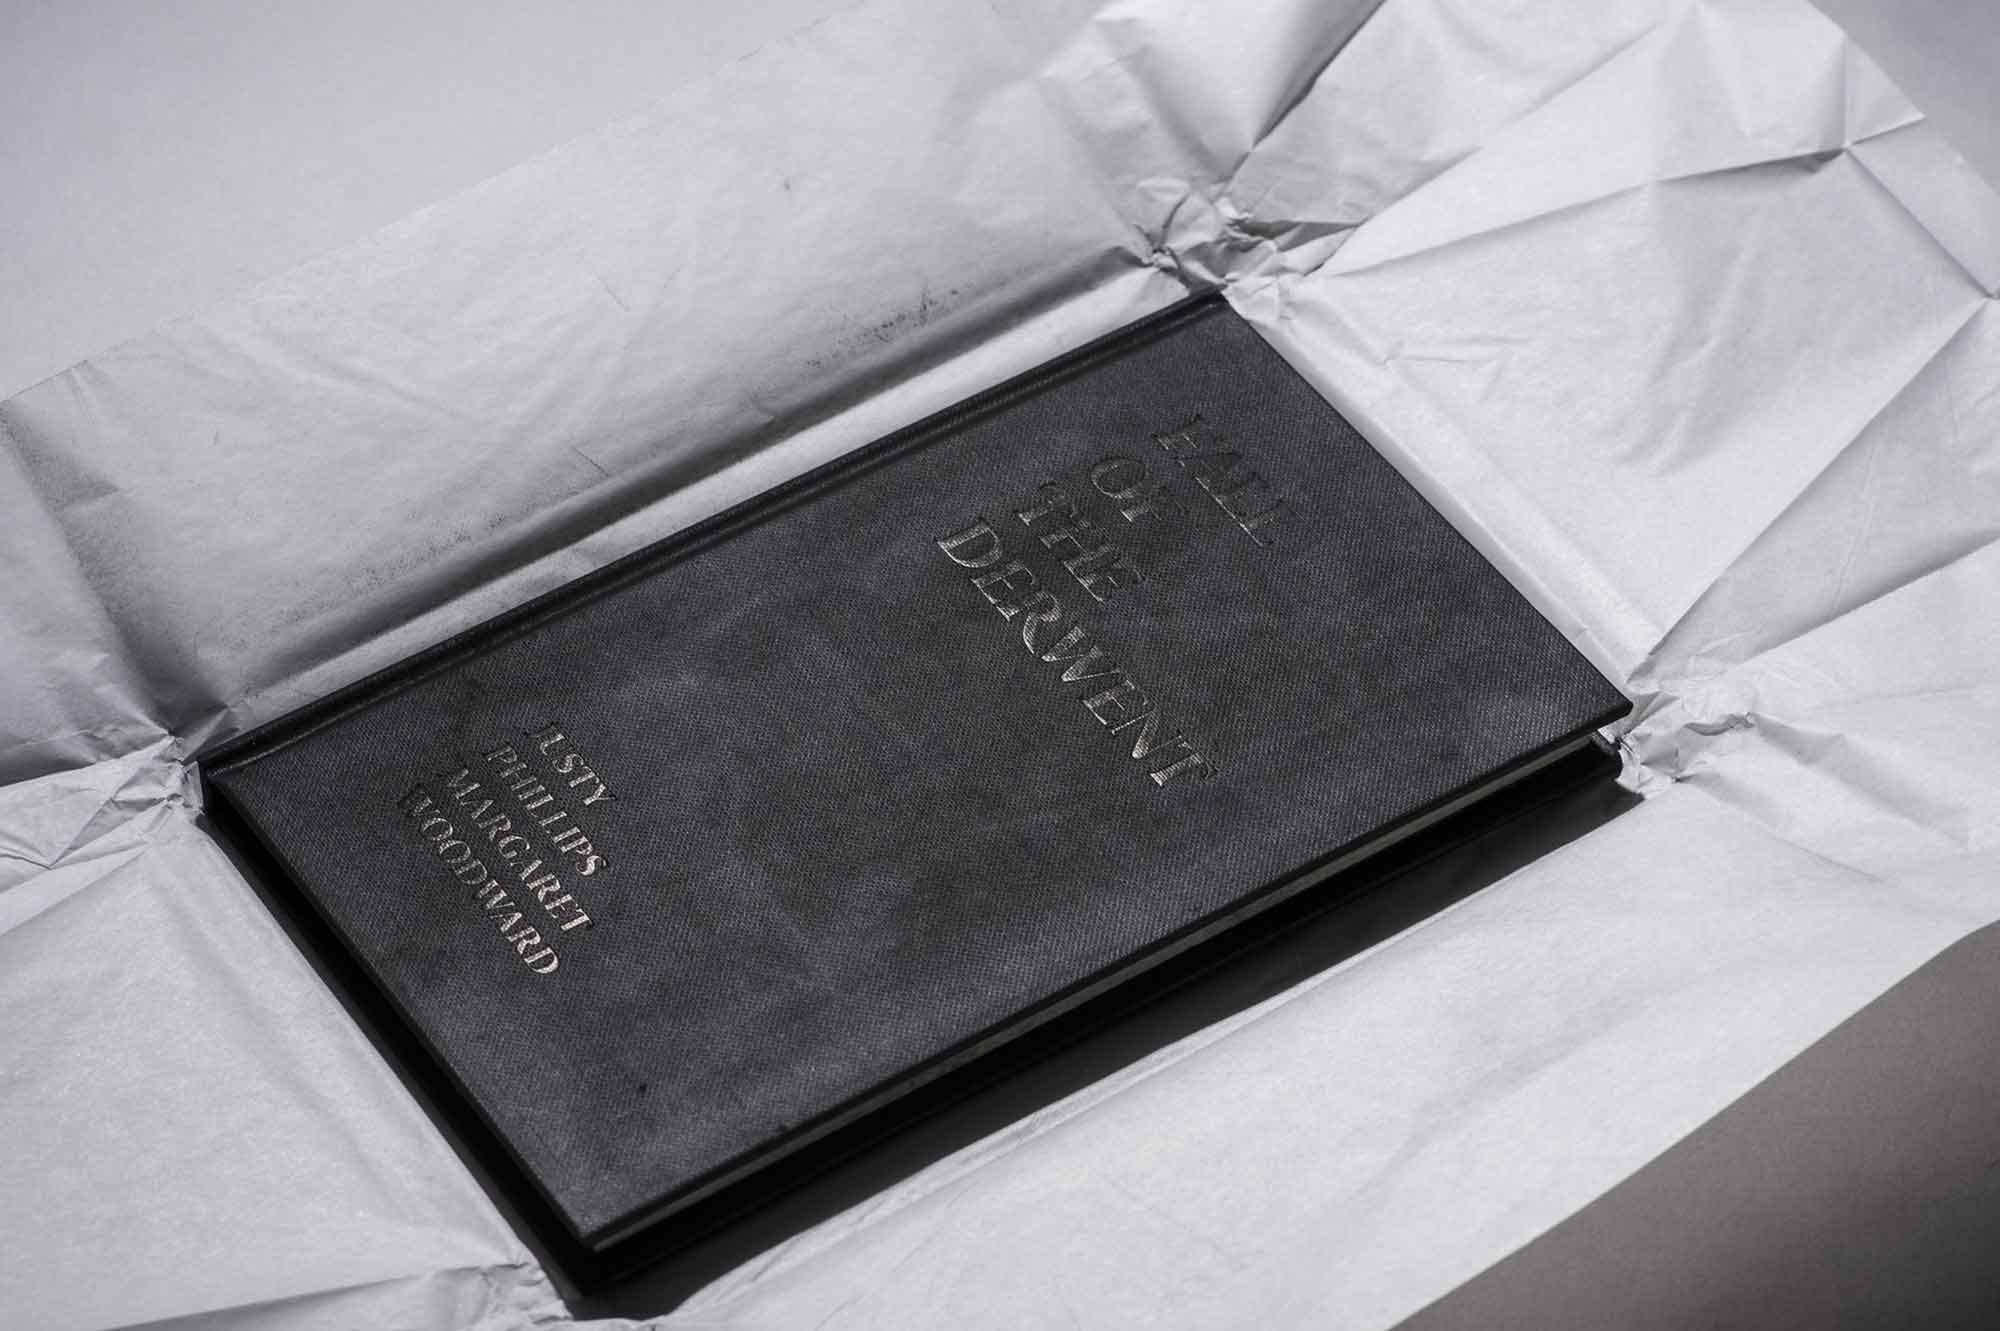 FOTD book, 2